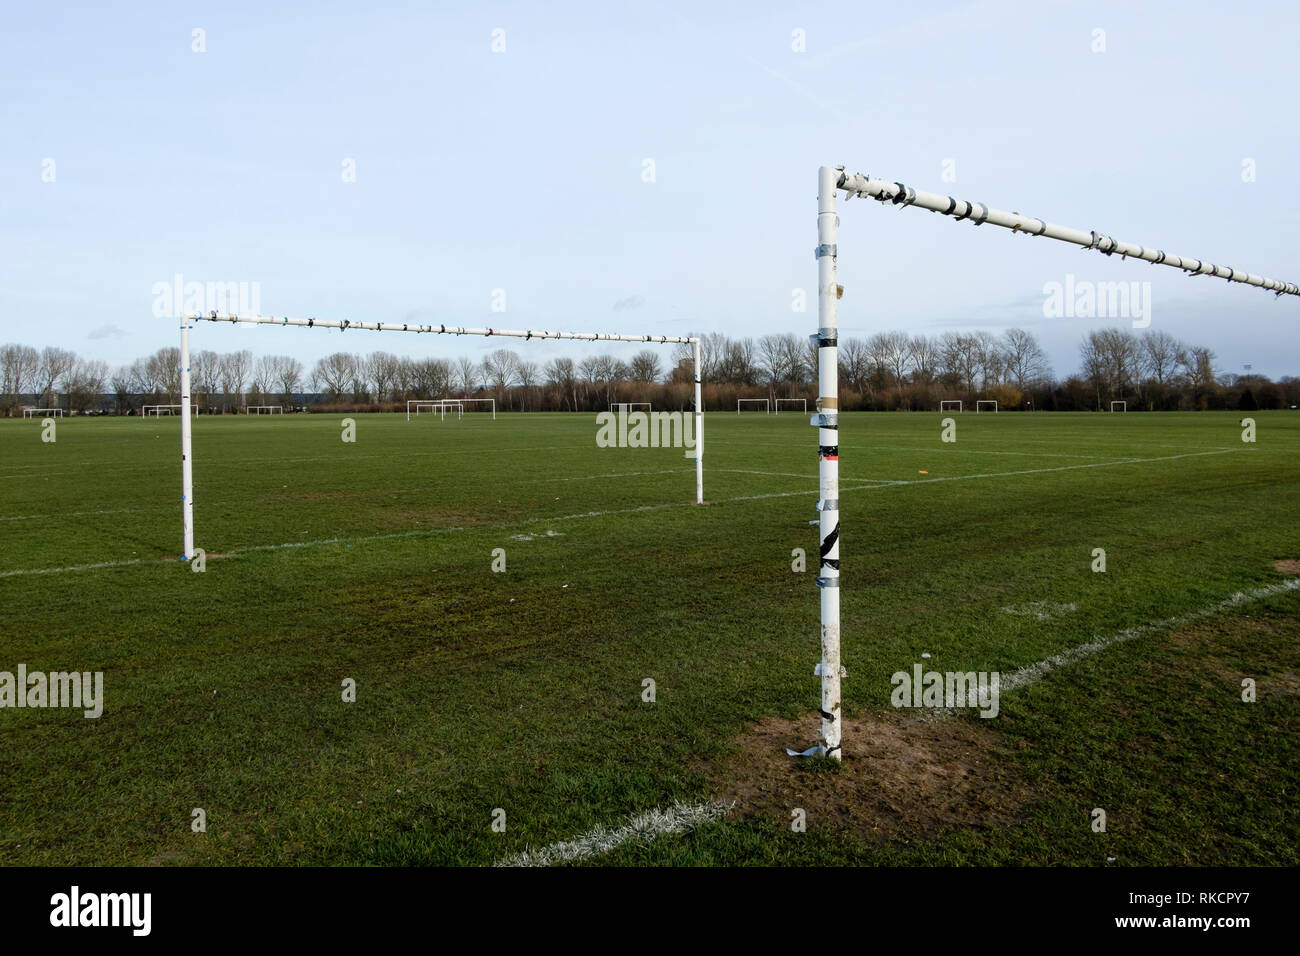 Hackney Marshes playing fields, London, UK - Stock Image